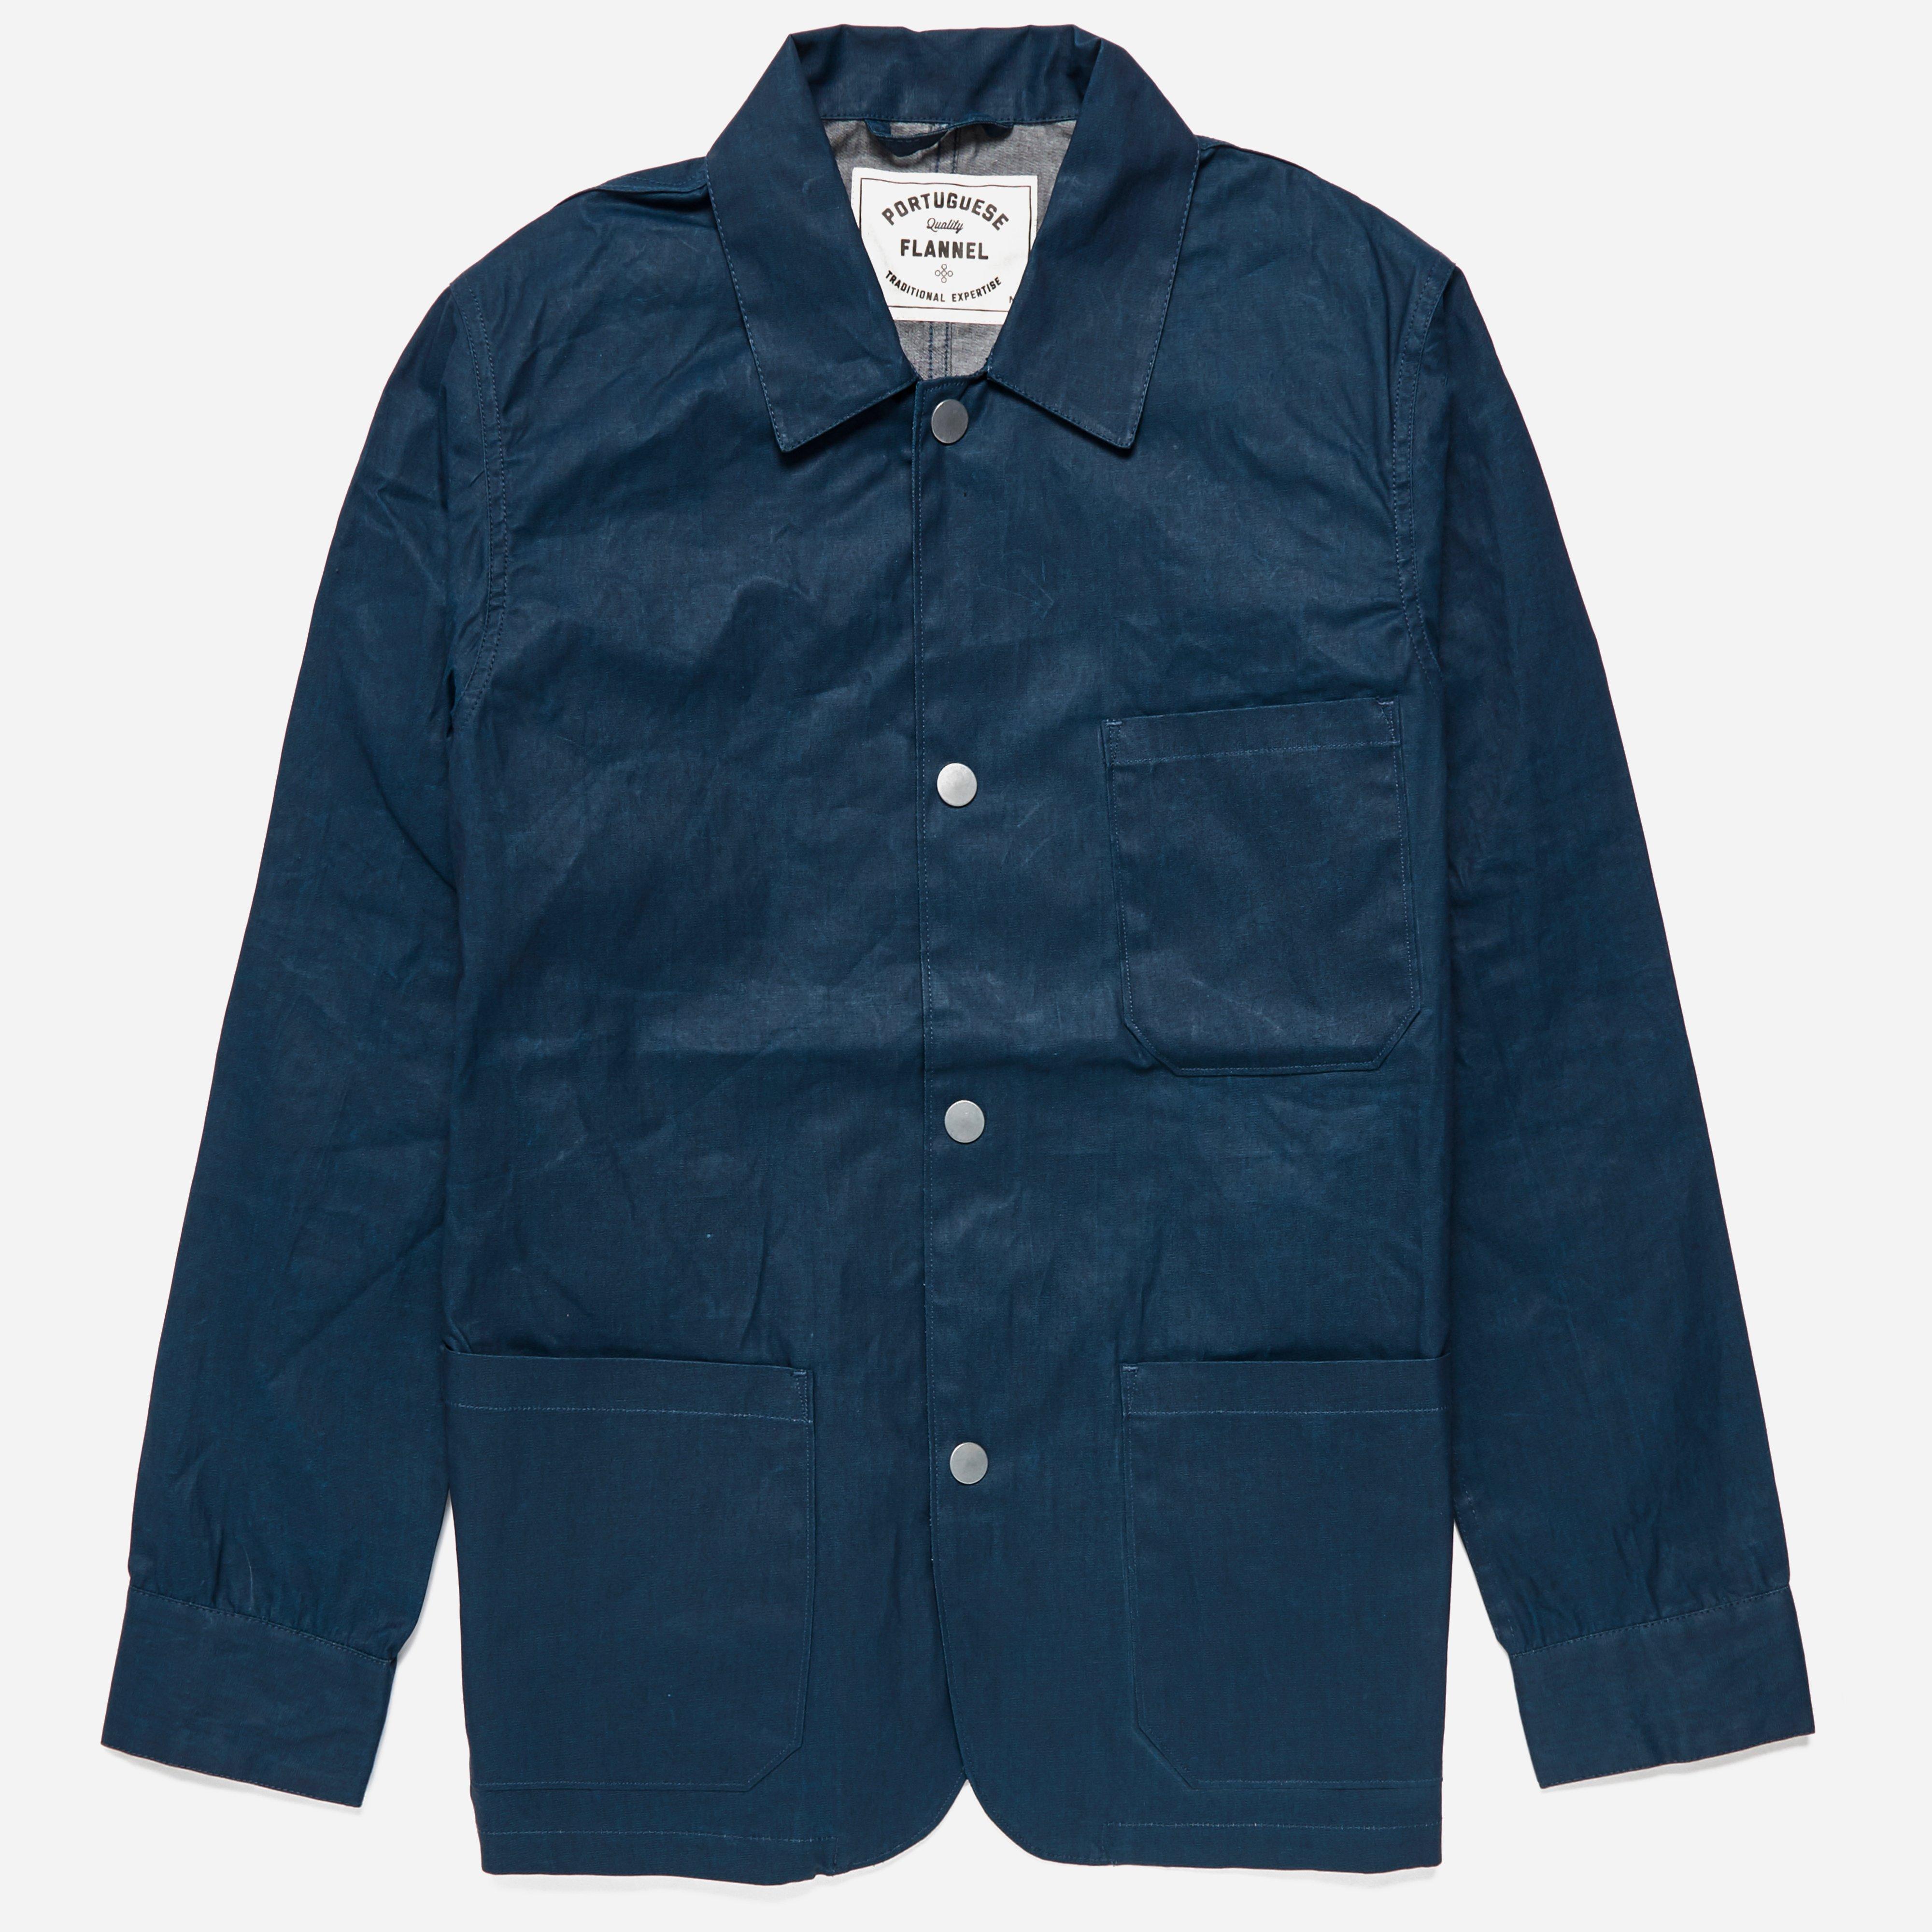 Portuguese Flannel Pinheiro Goma Jacket